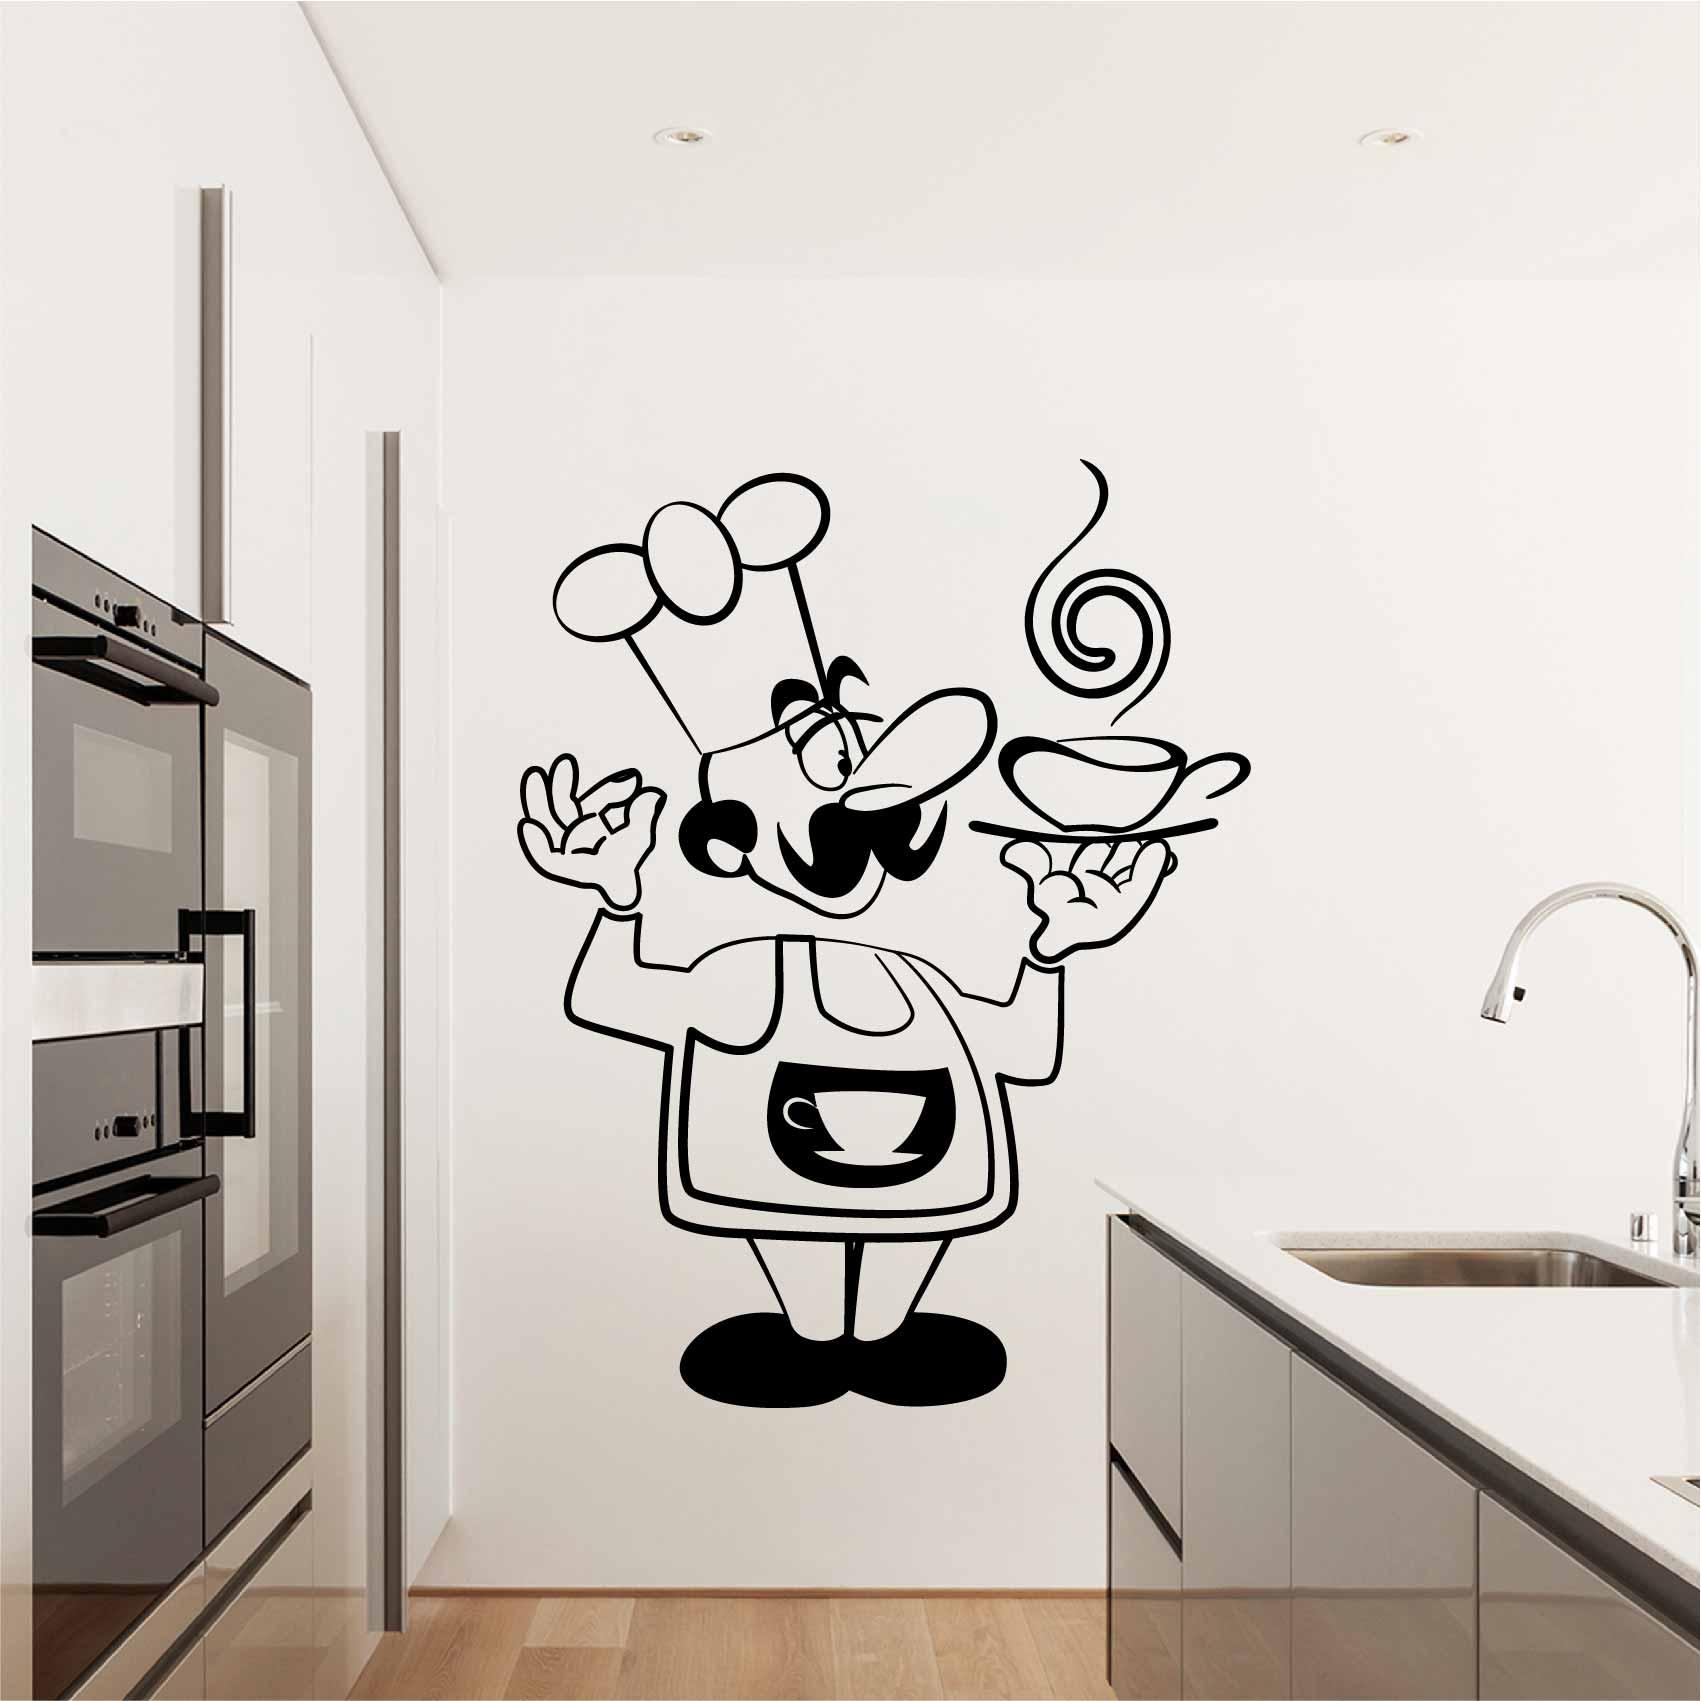 Stickers Cuisine Chef Dessin - Autocollant muraux et deco